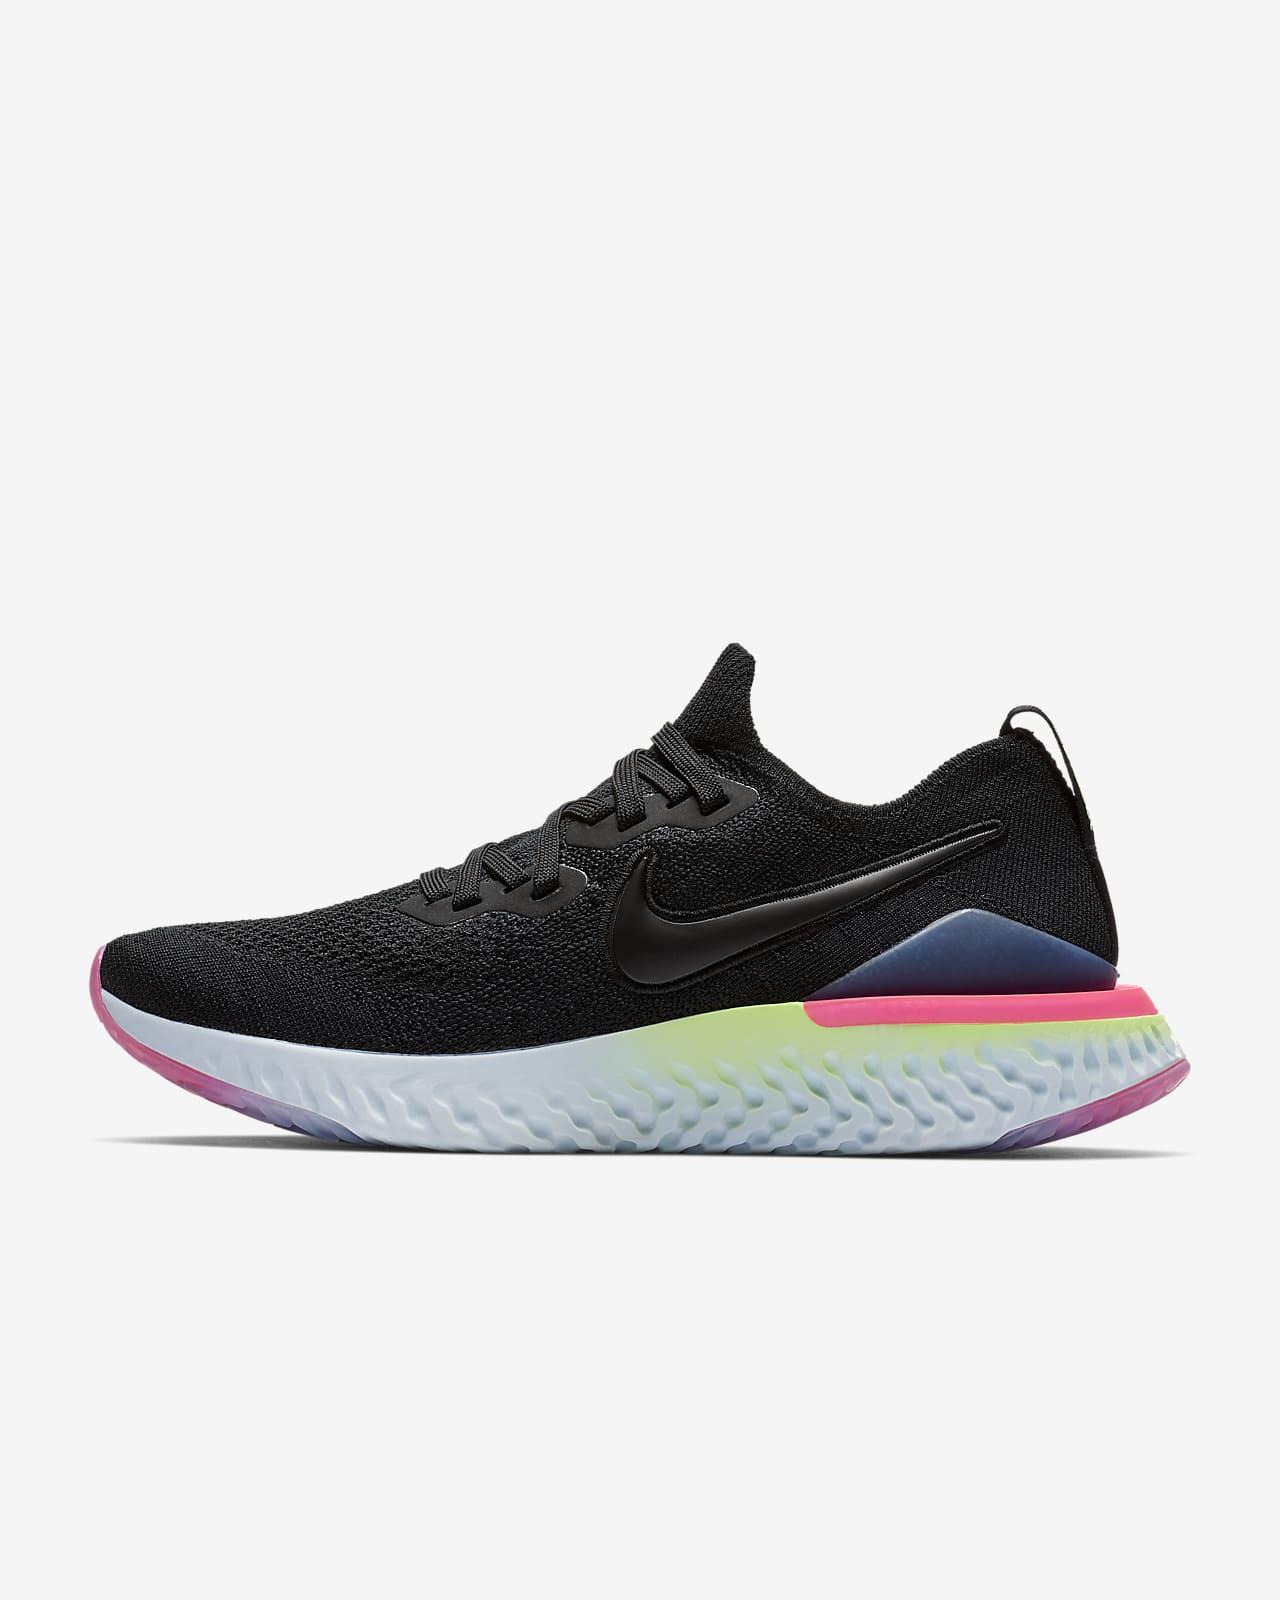 Women's Nike Epic React Flyknit 2 'Black / Lime Blast' .97 Free Shipping